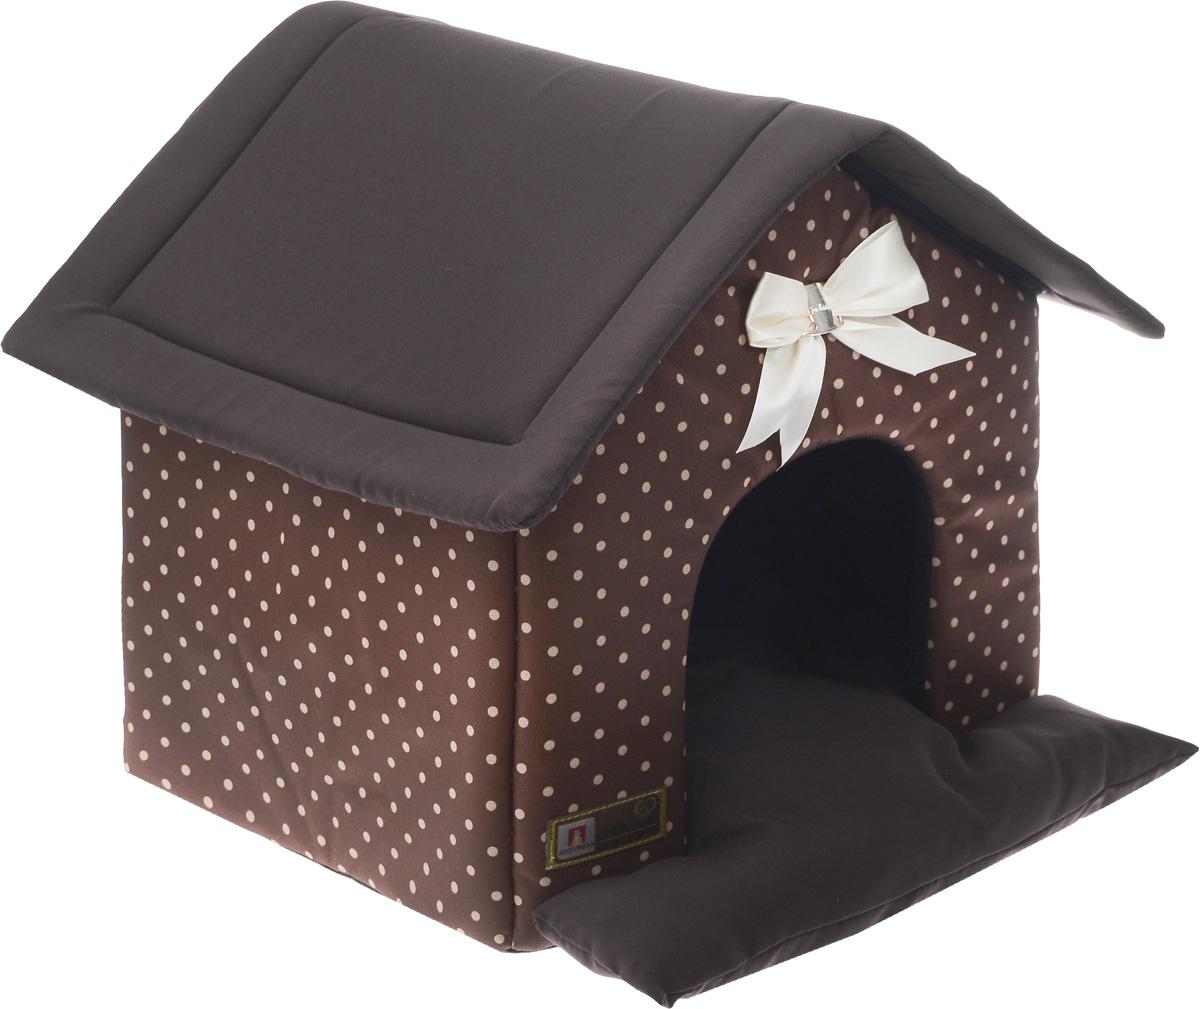 Лежак для собак и кошек Зоогурман Ампир. Горох, 45 х 40 х 45 см зоогурман консервы для собак зоогурман спецмяс деликатес желудочки куриные 250 г